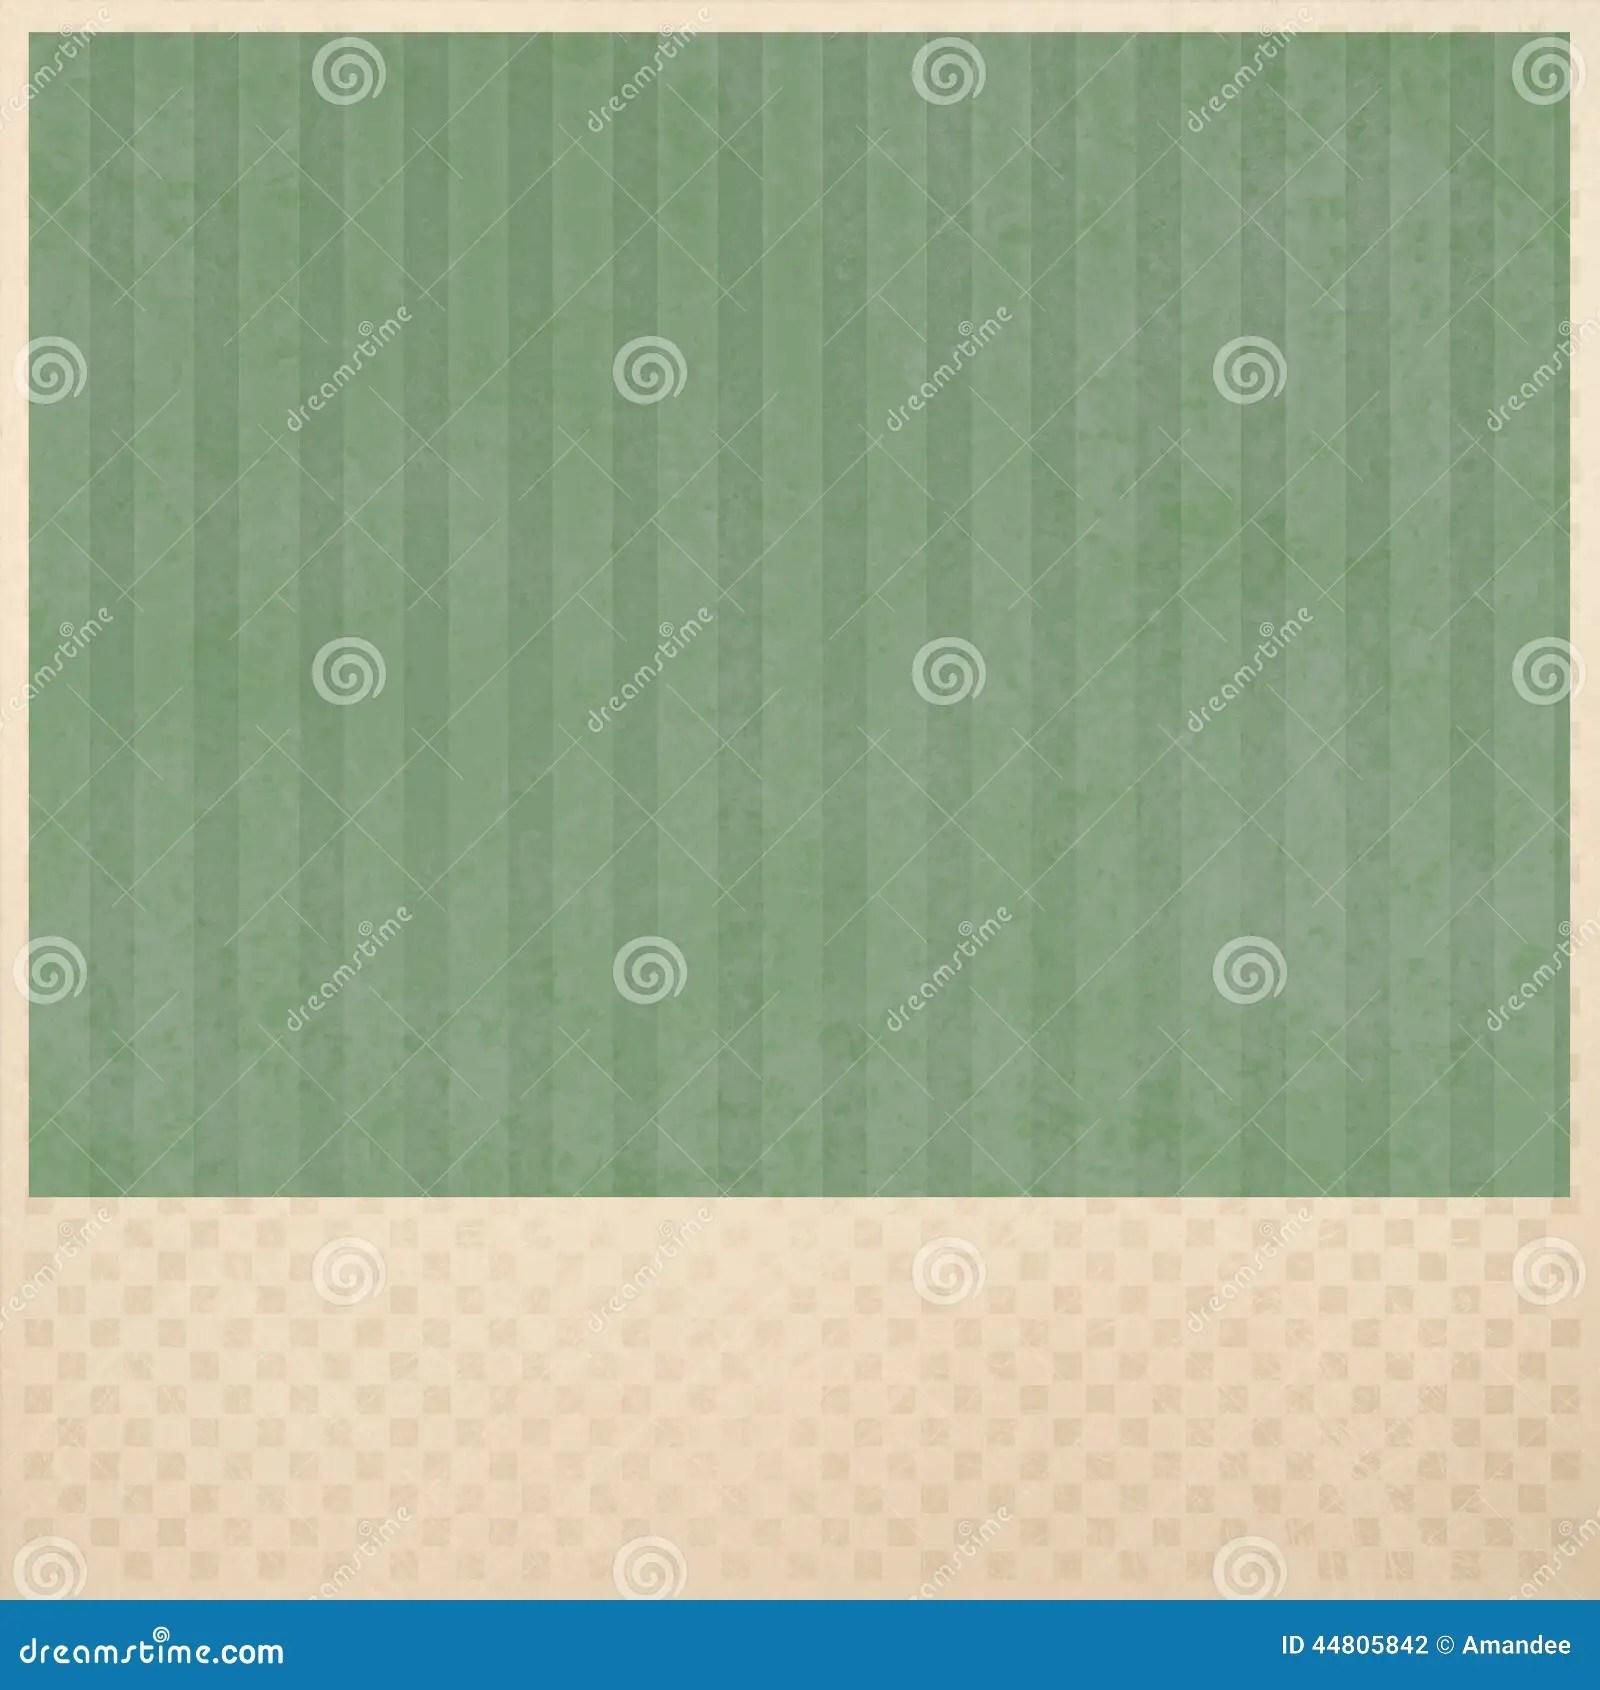 Green Striped Background On Beige Checkered Pattern